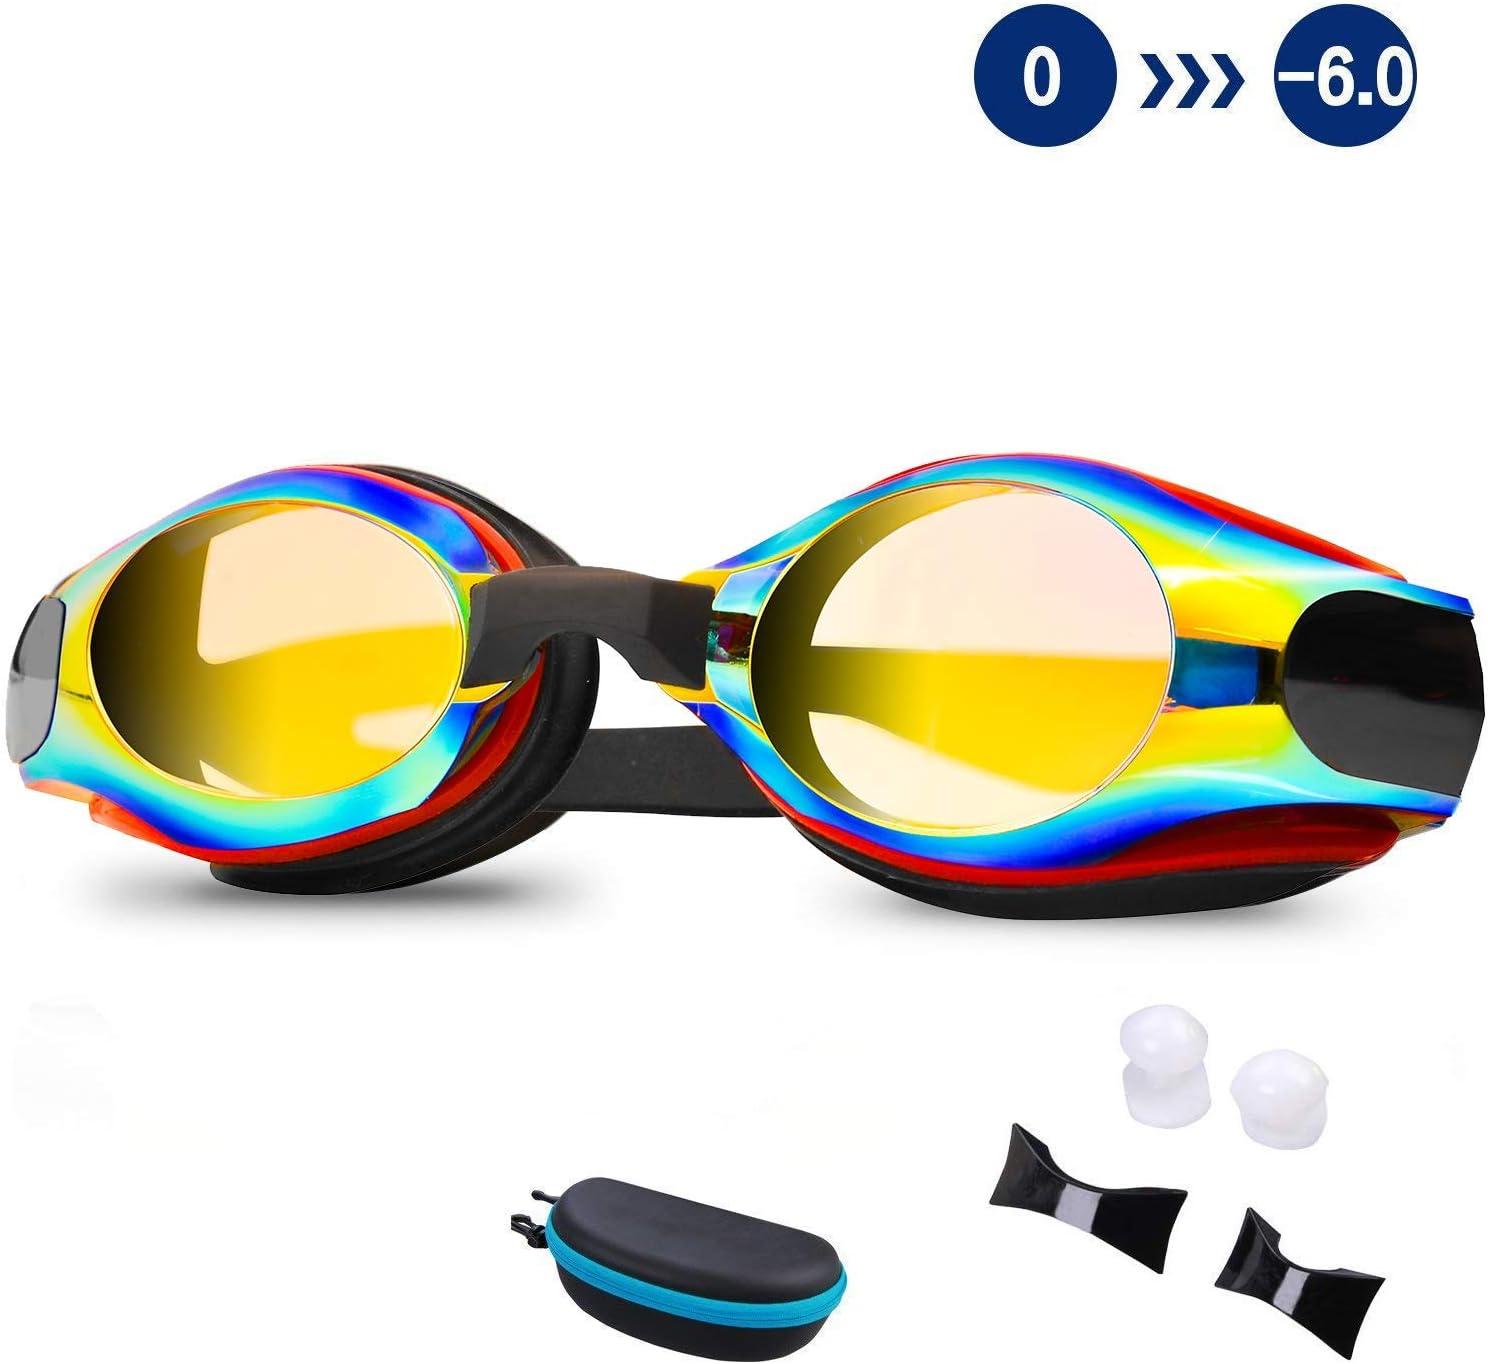 DEFUNX Swim Goggles,Shortsighted Swimming Goggles Myopic with Prescription Lenses Anti Fog for Women Kids Men Swimming Goggles /…